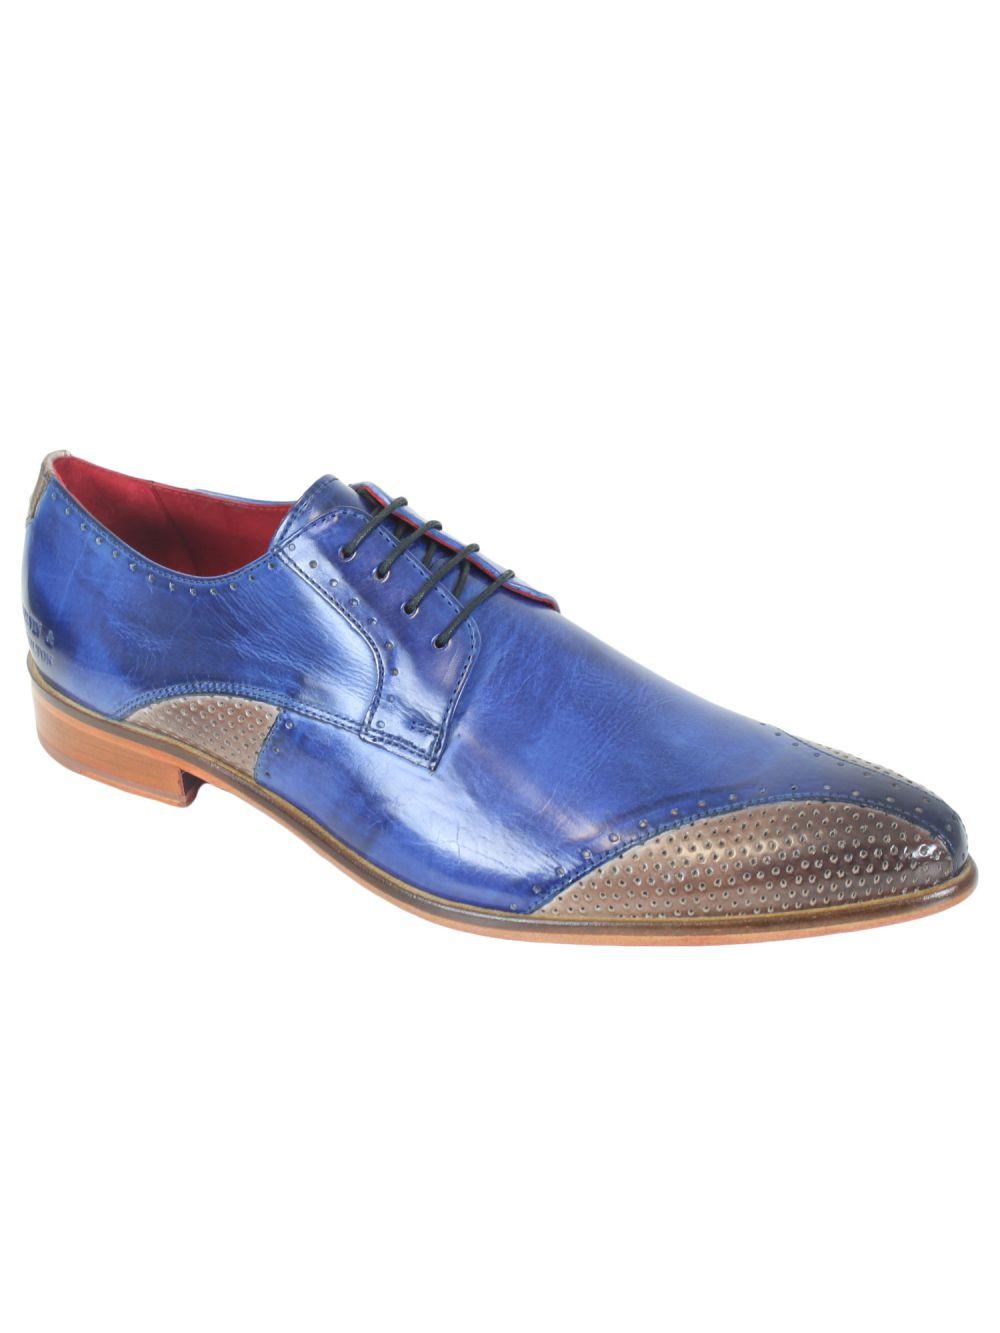 chaussures cuir bleu melvin hamilton toni 9 pas cher. Black Bedroom Furniture Sets. Home Design Ideas